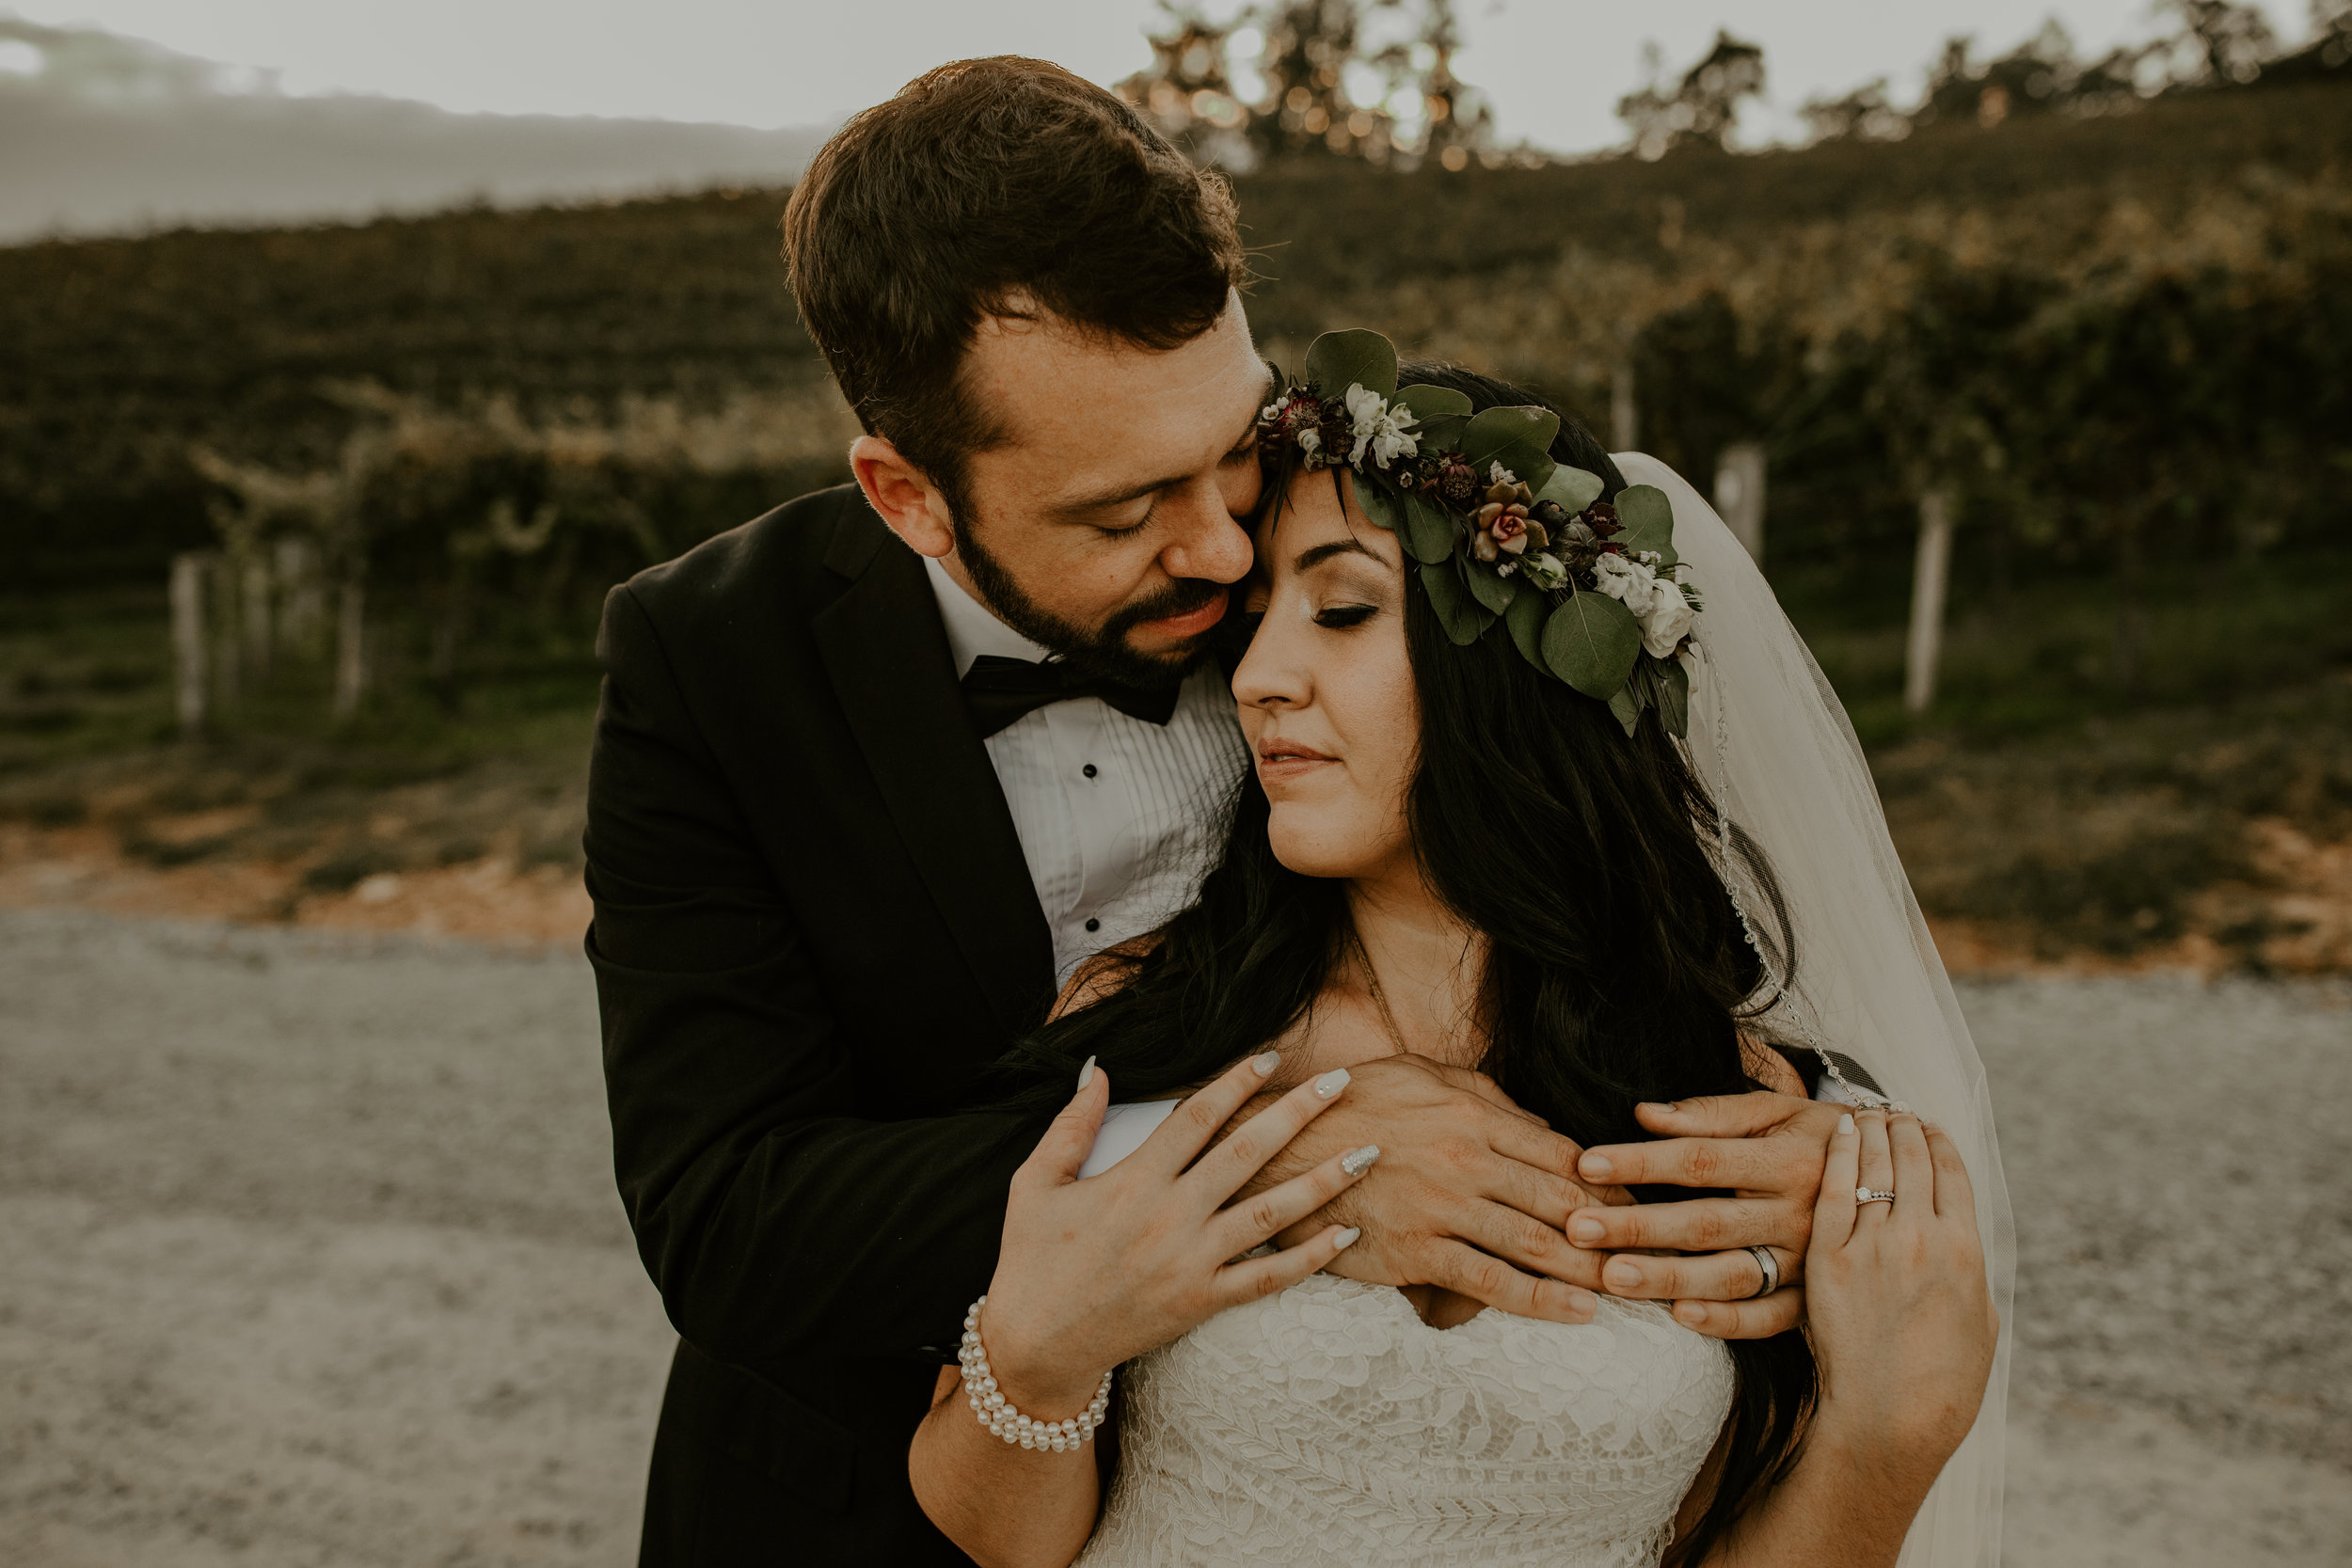 Point Lookout Vineyards Hendersonville North Carolina -Wedding-Renee and Jason-92.JPG